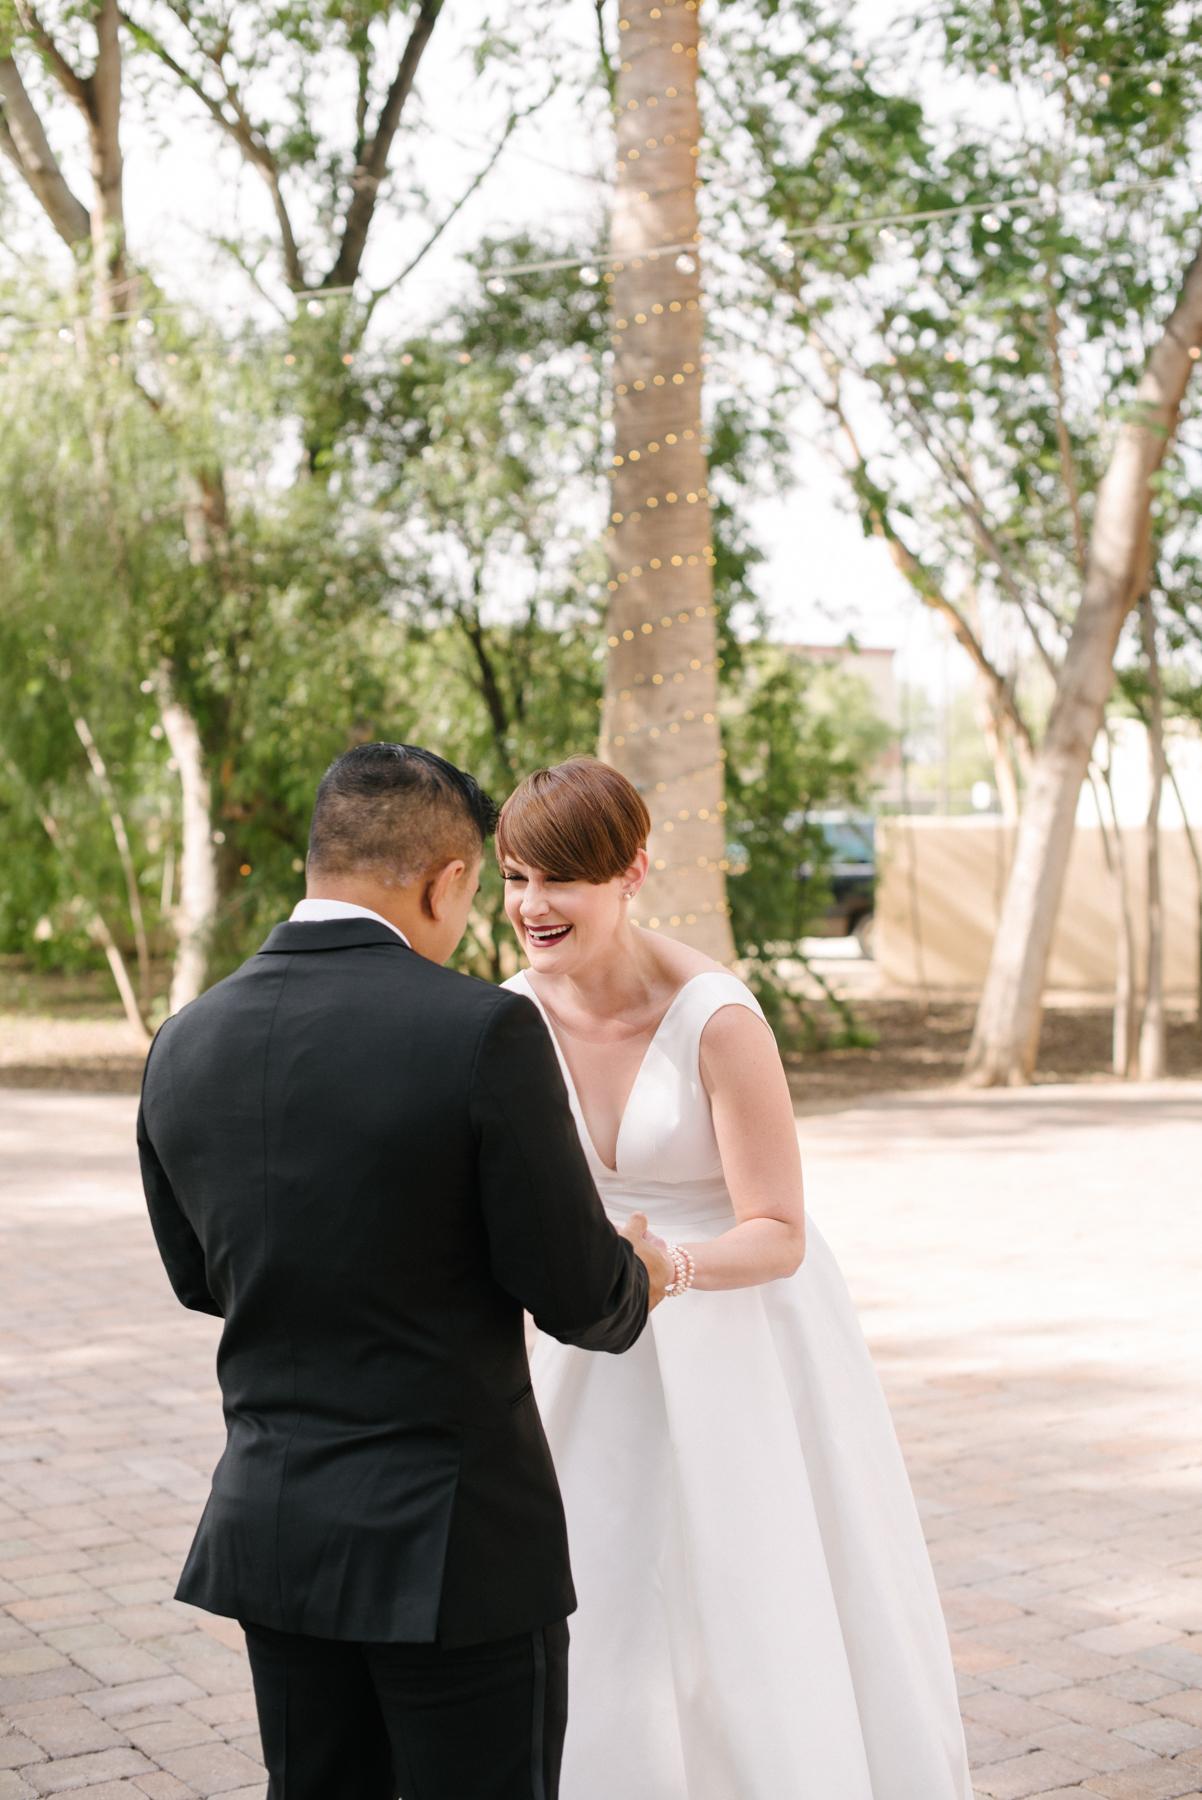 Secret Garden Event Center Wedding - Meredith Amadee Photography-36.jpg